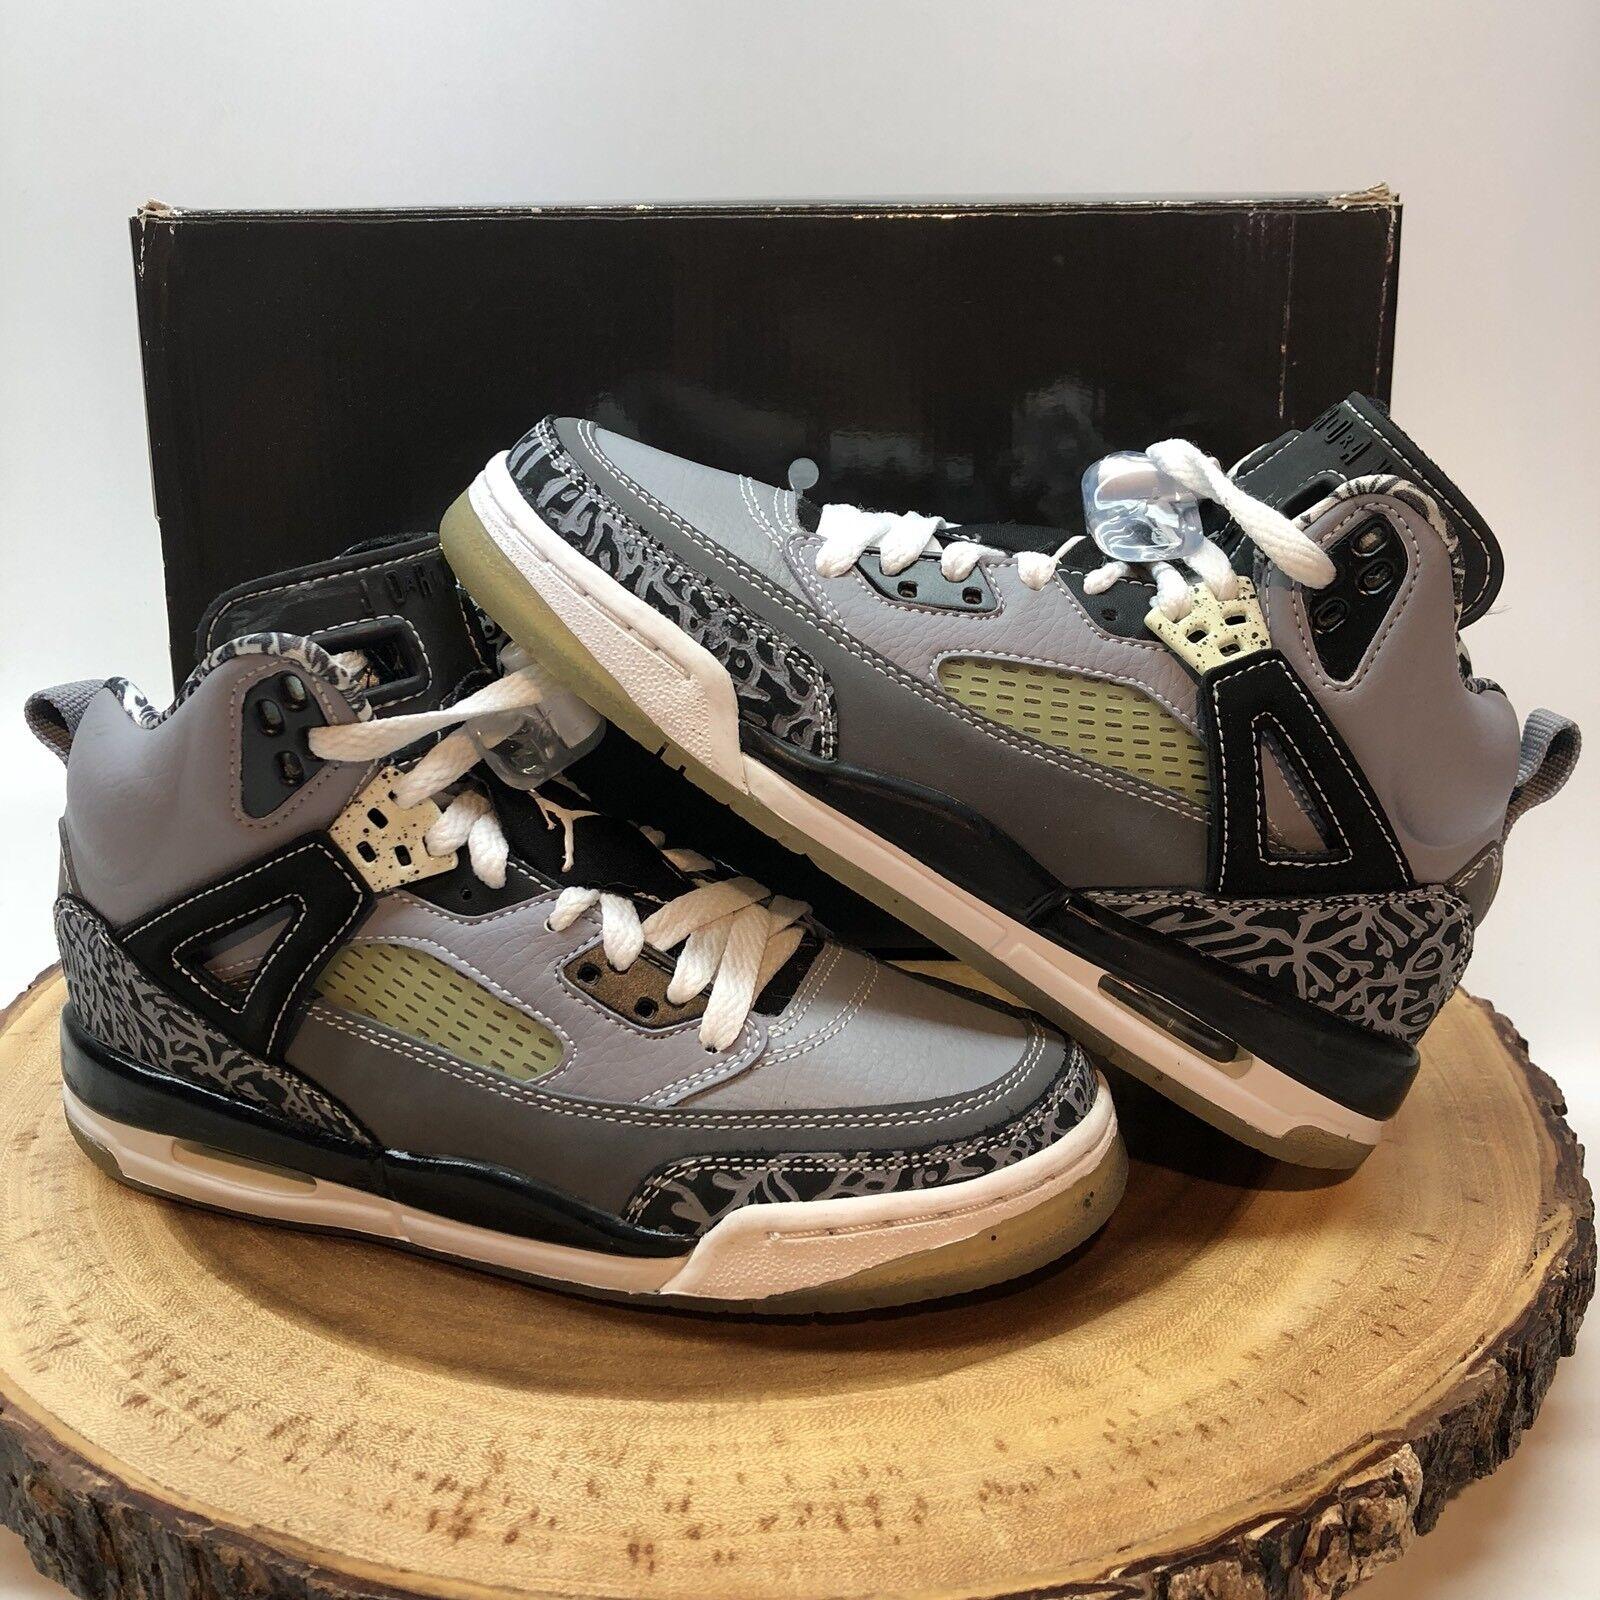 Nike Air Jordan Spizike Cool Grey Size 4.5y Black Cement Retro III IV VI VII XI